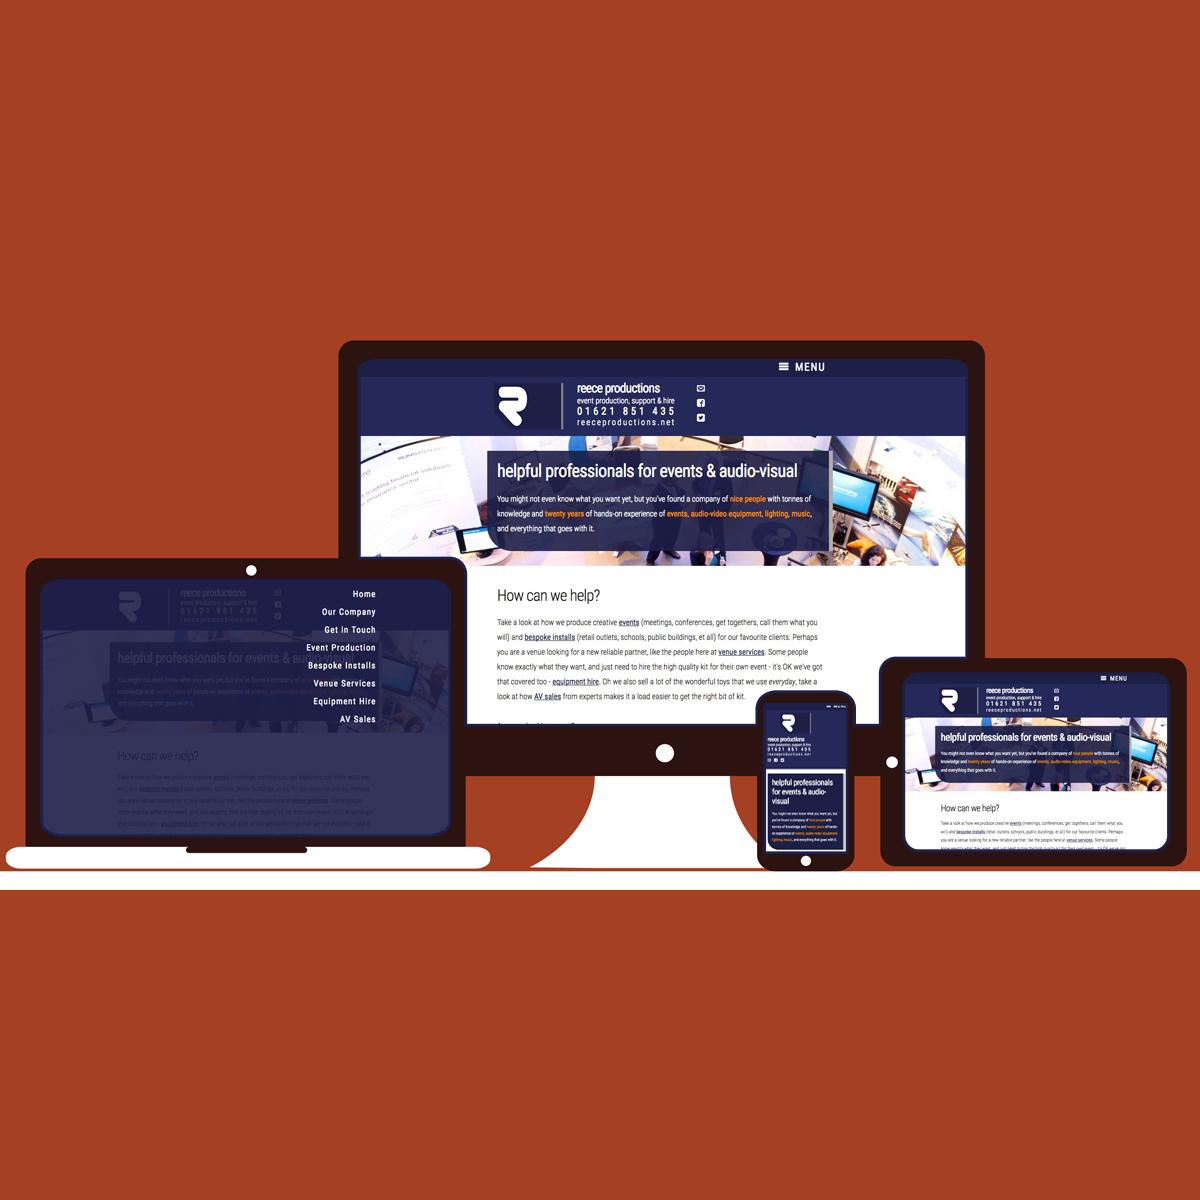 The Digital Moose | Web Design, Graphics, Audio, Video | Reece Productions